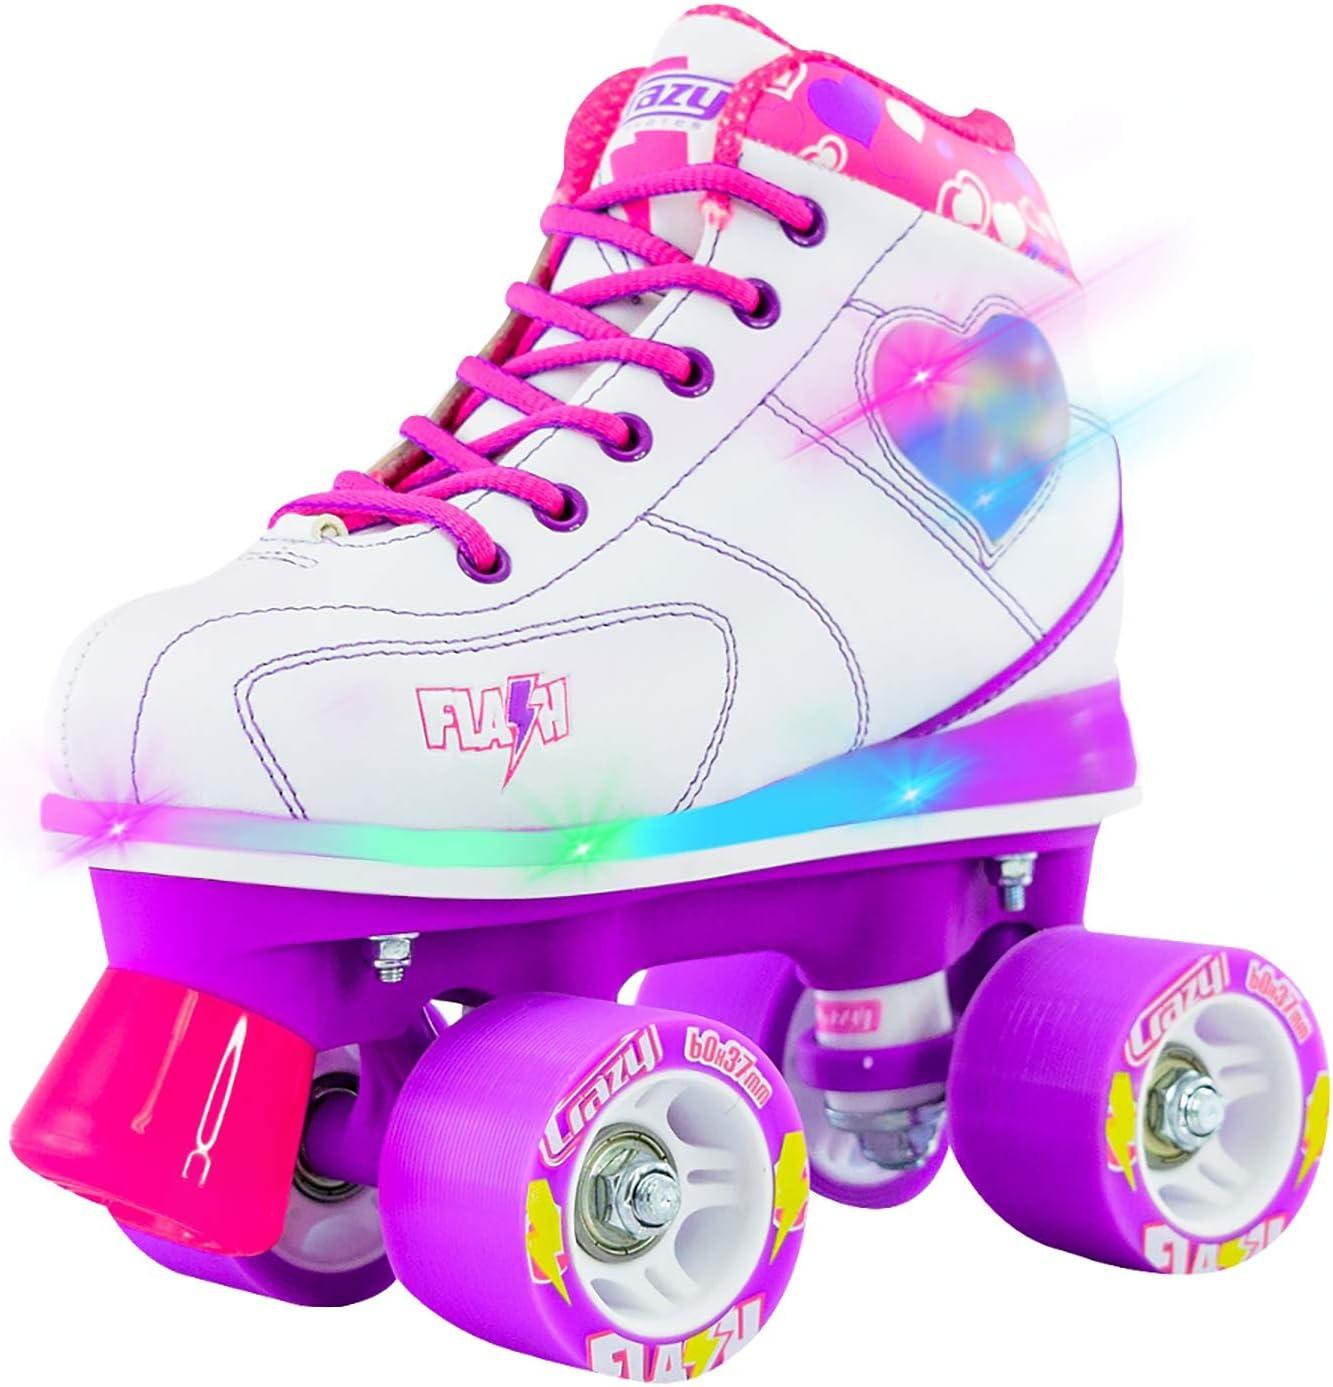 Crazy Skates Flash Roller Skates for Girls – Light Up Skates with Ultra Bright LED Lights and Flashing Lightning Bolt – White Patines